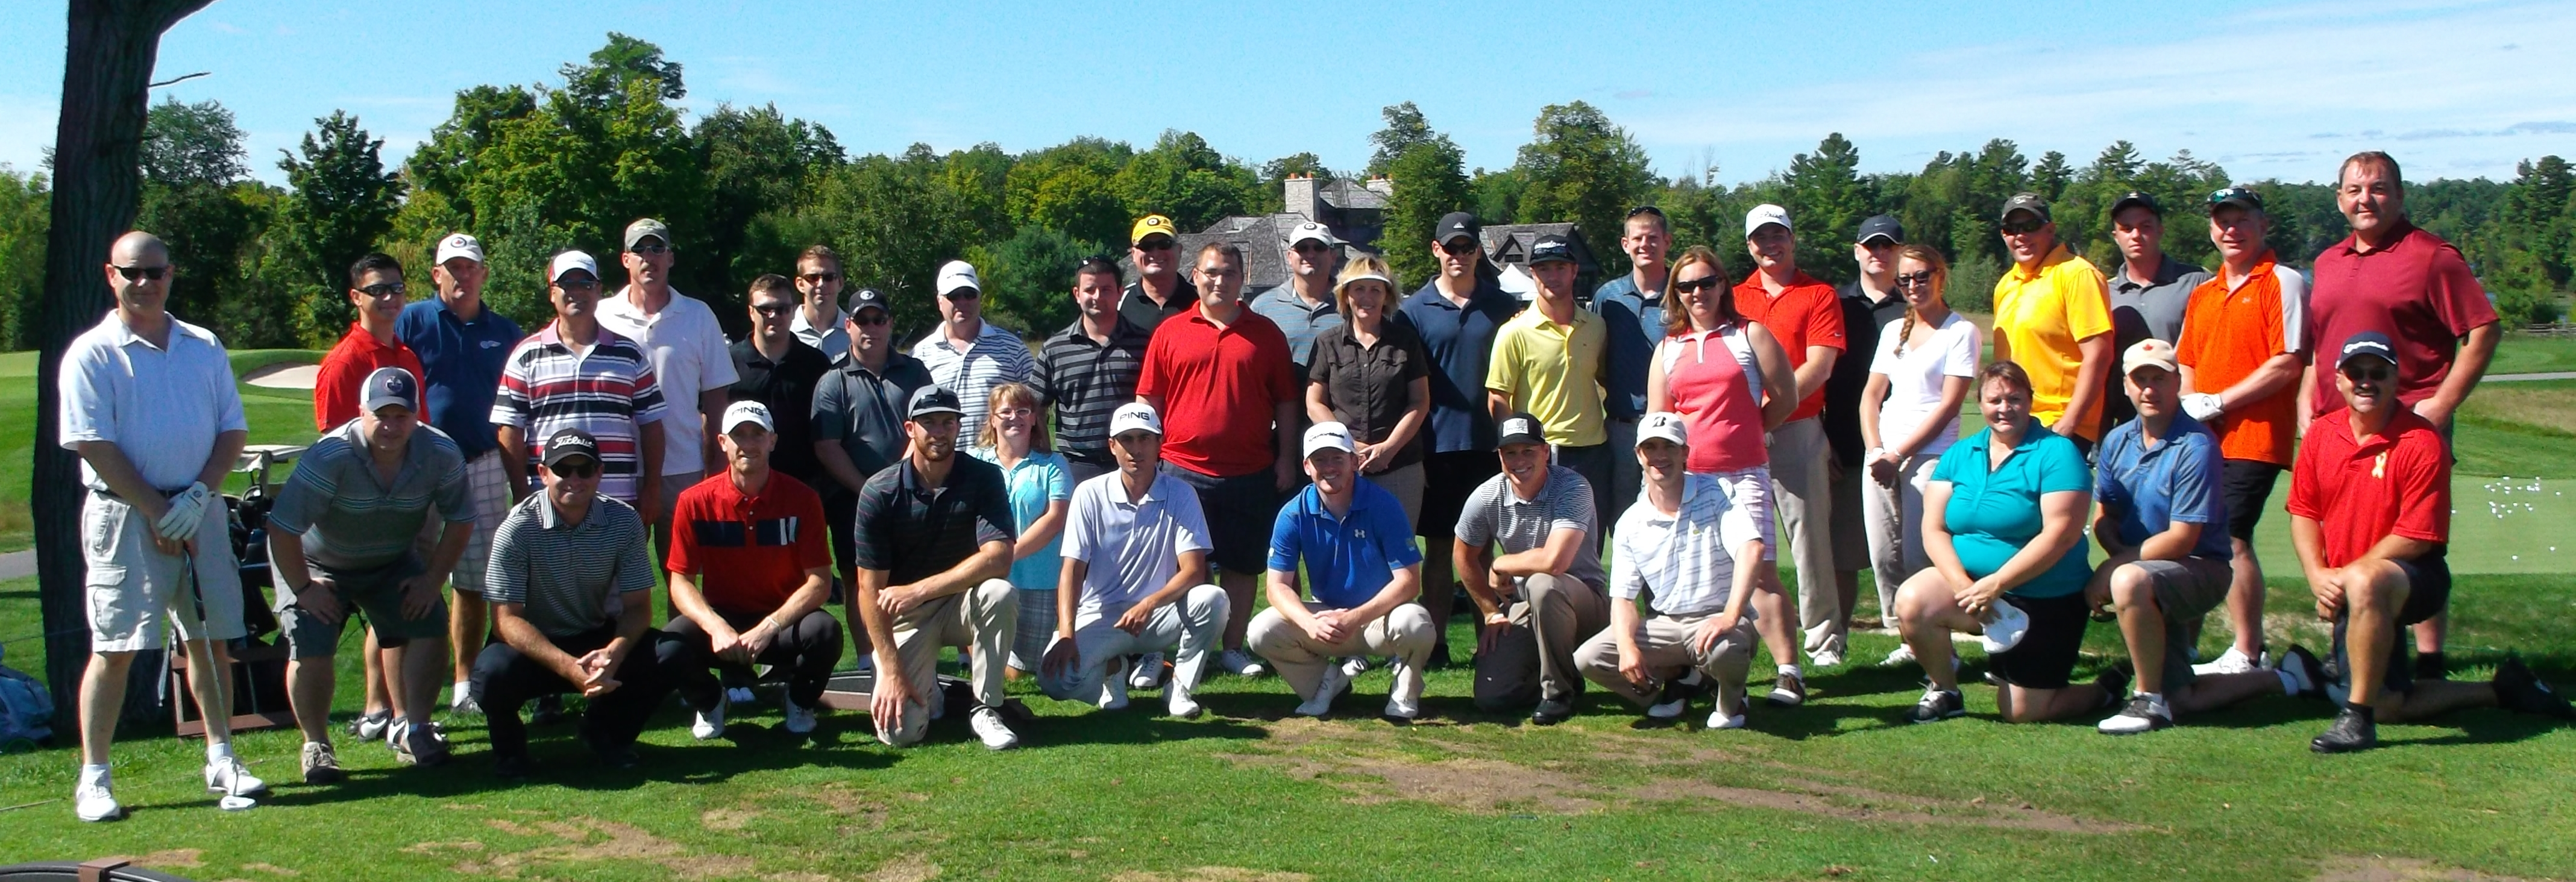 PGA of Canada Military Golf Clinic